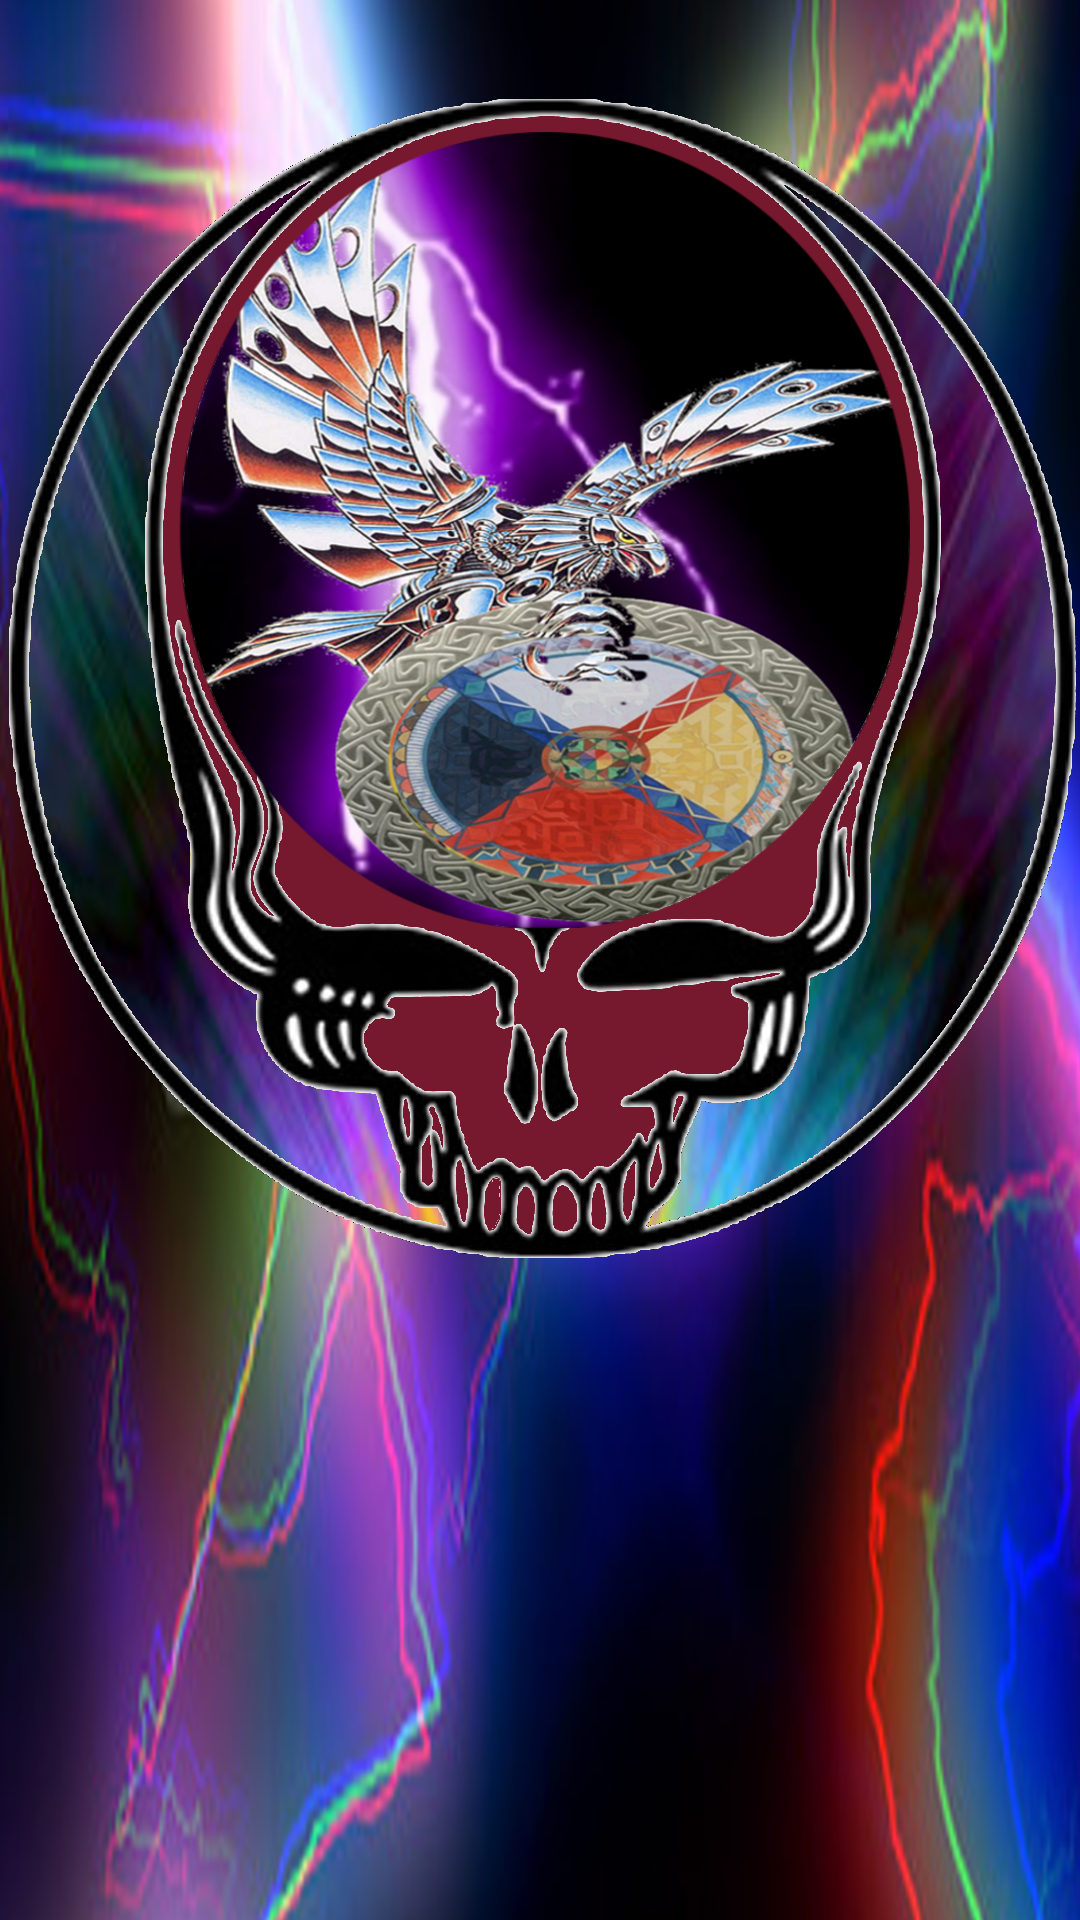 Pin By E Dole On Grateful Dead Combined Symbols Pinterest